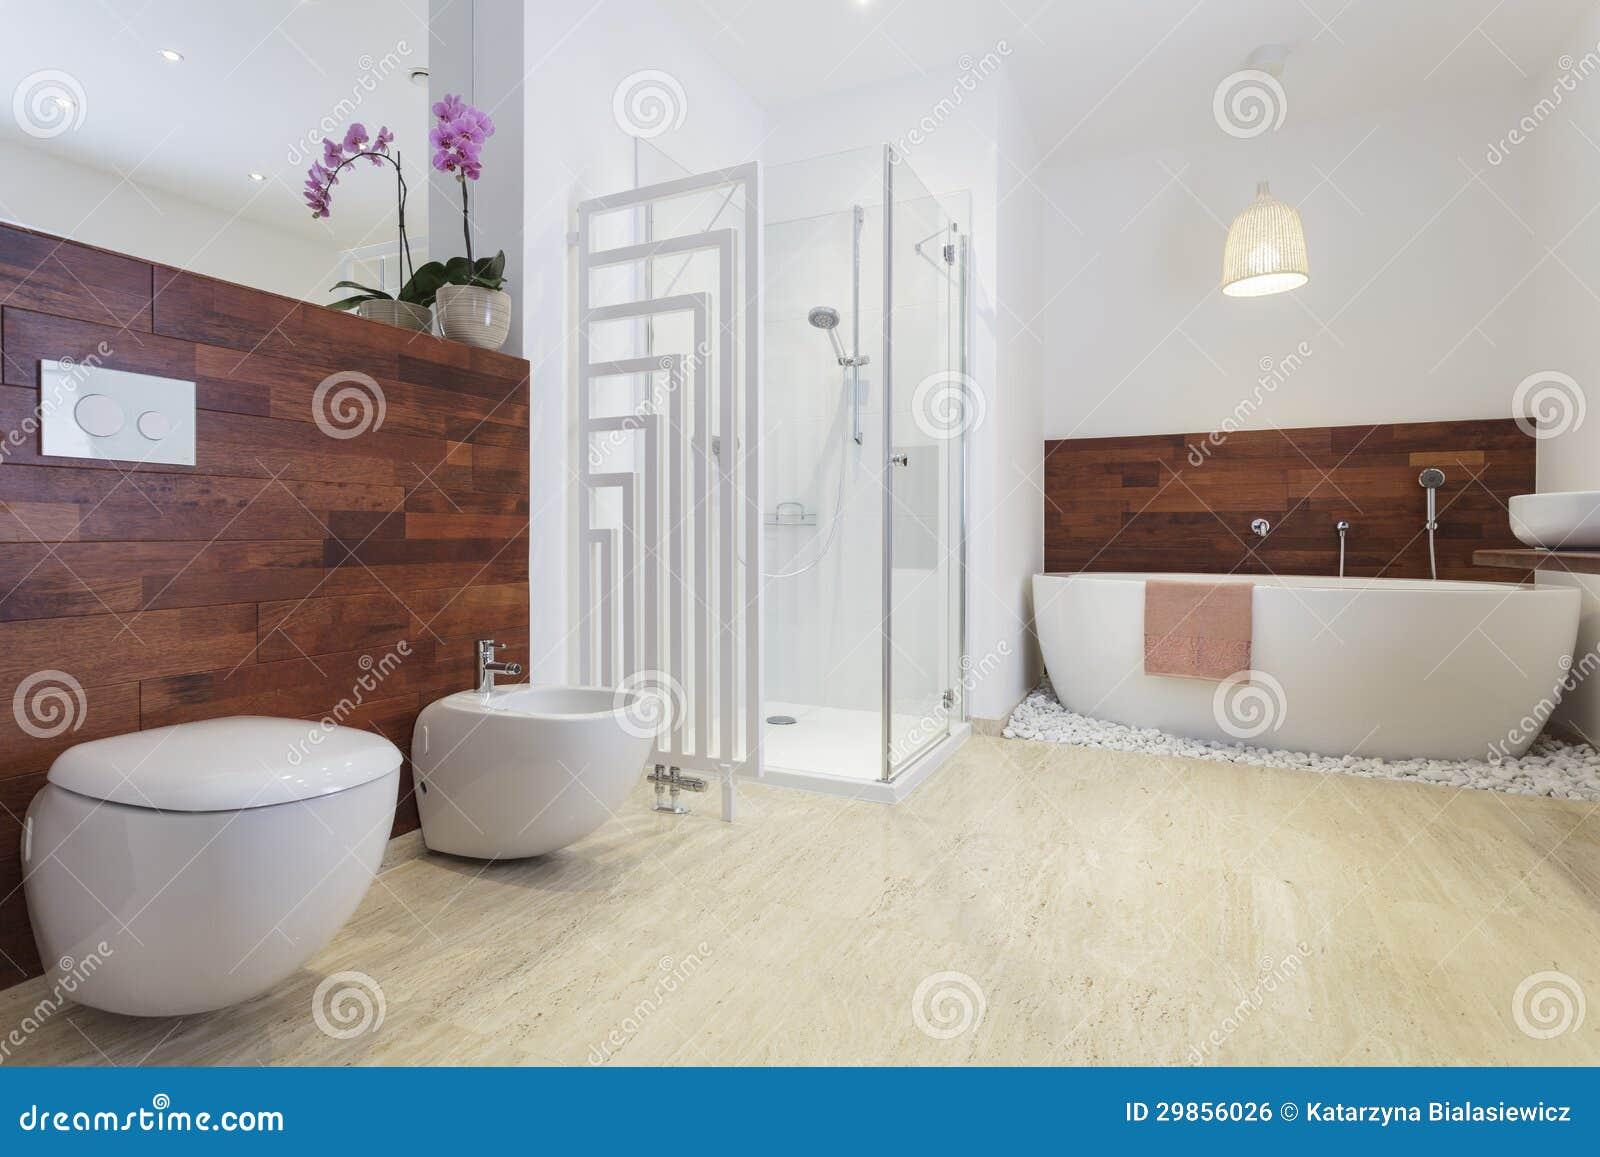 Bathroom stock photo. Image of inside, fixture, luxury - 29856026